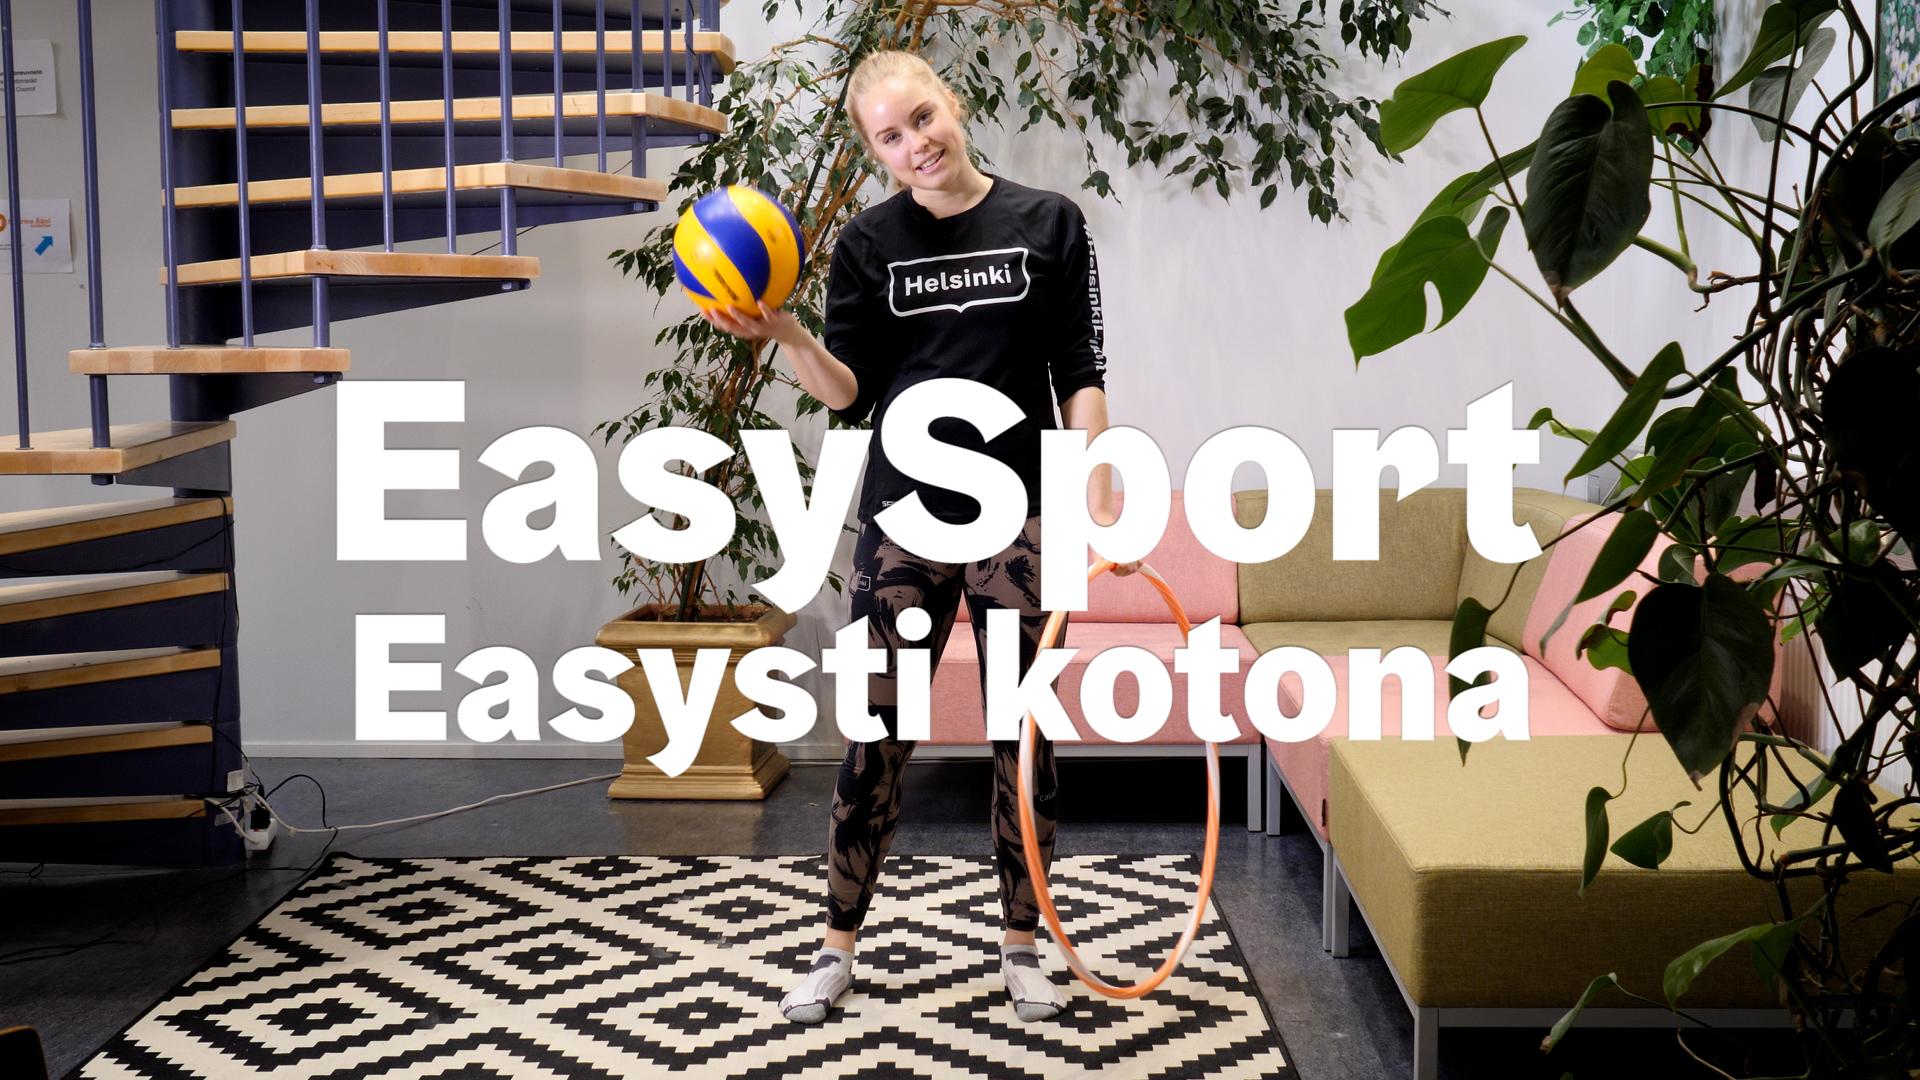 EasySport: Palloilu